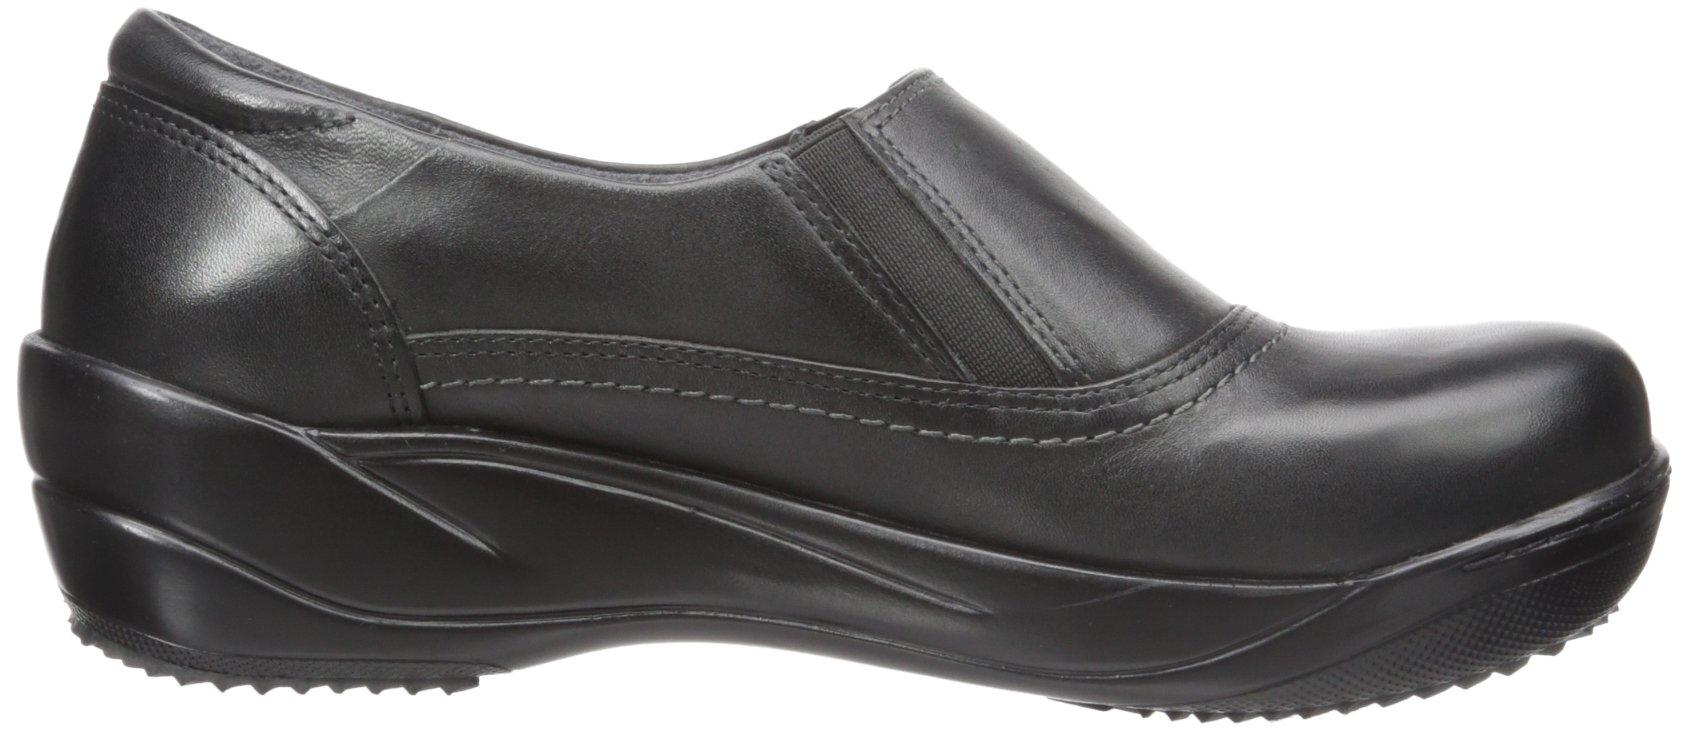 Cherokee Women's Maggie Health Care & Food Service Shoe, Black, 8 M US by Cherokee (Image #7)